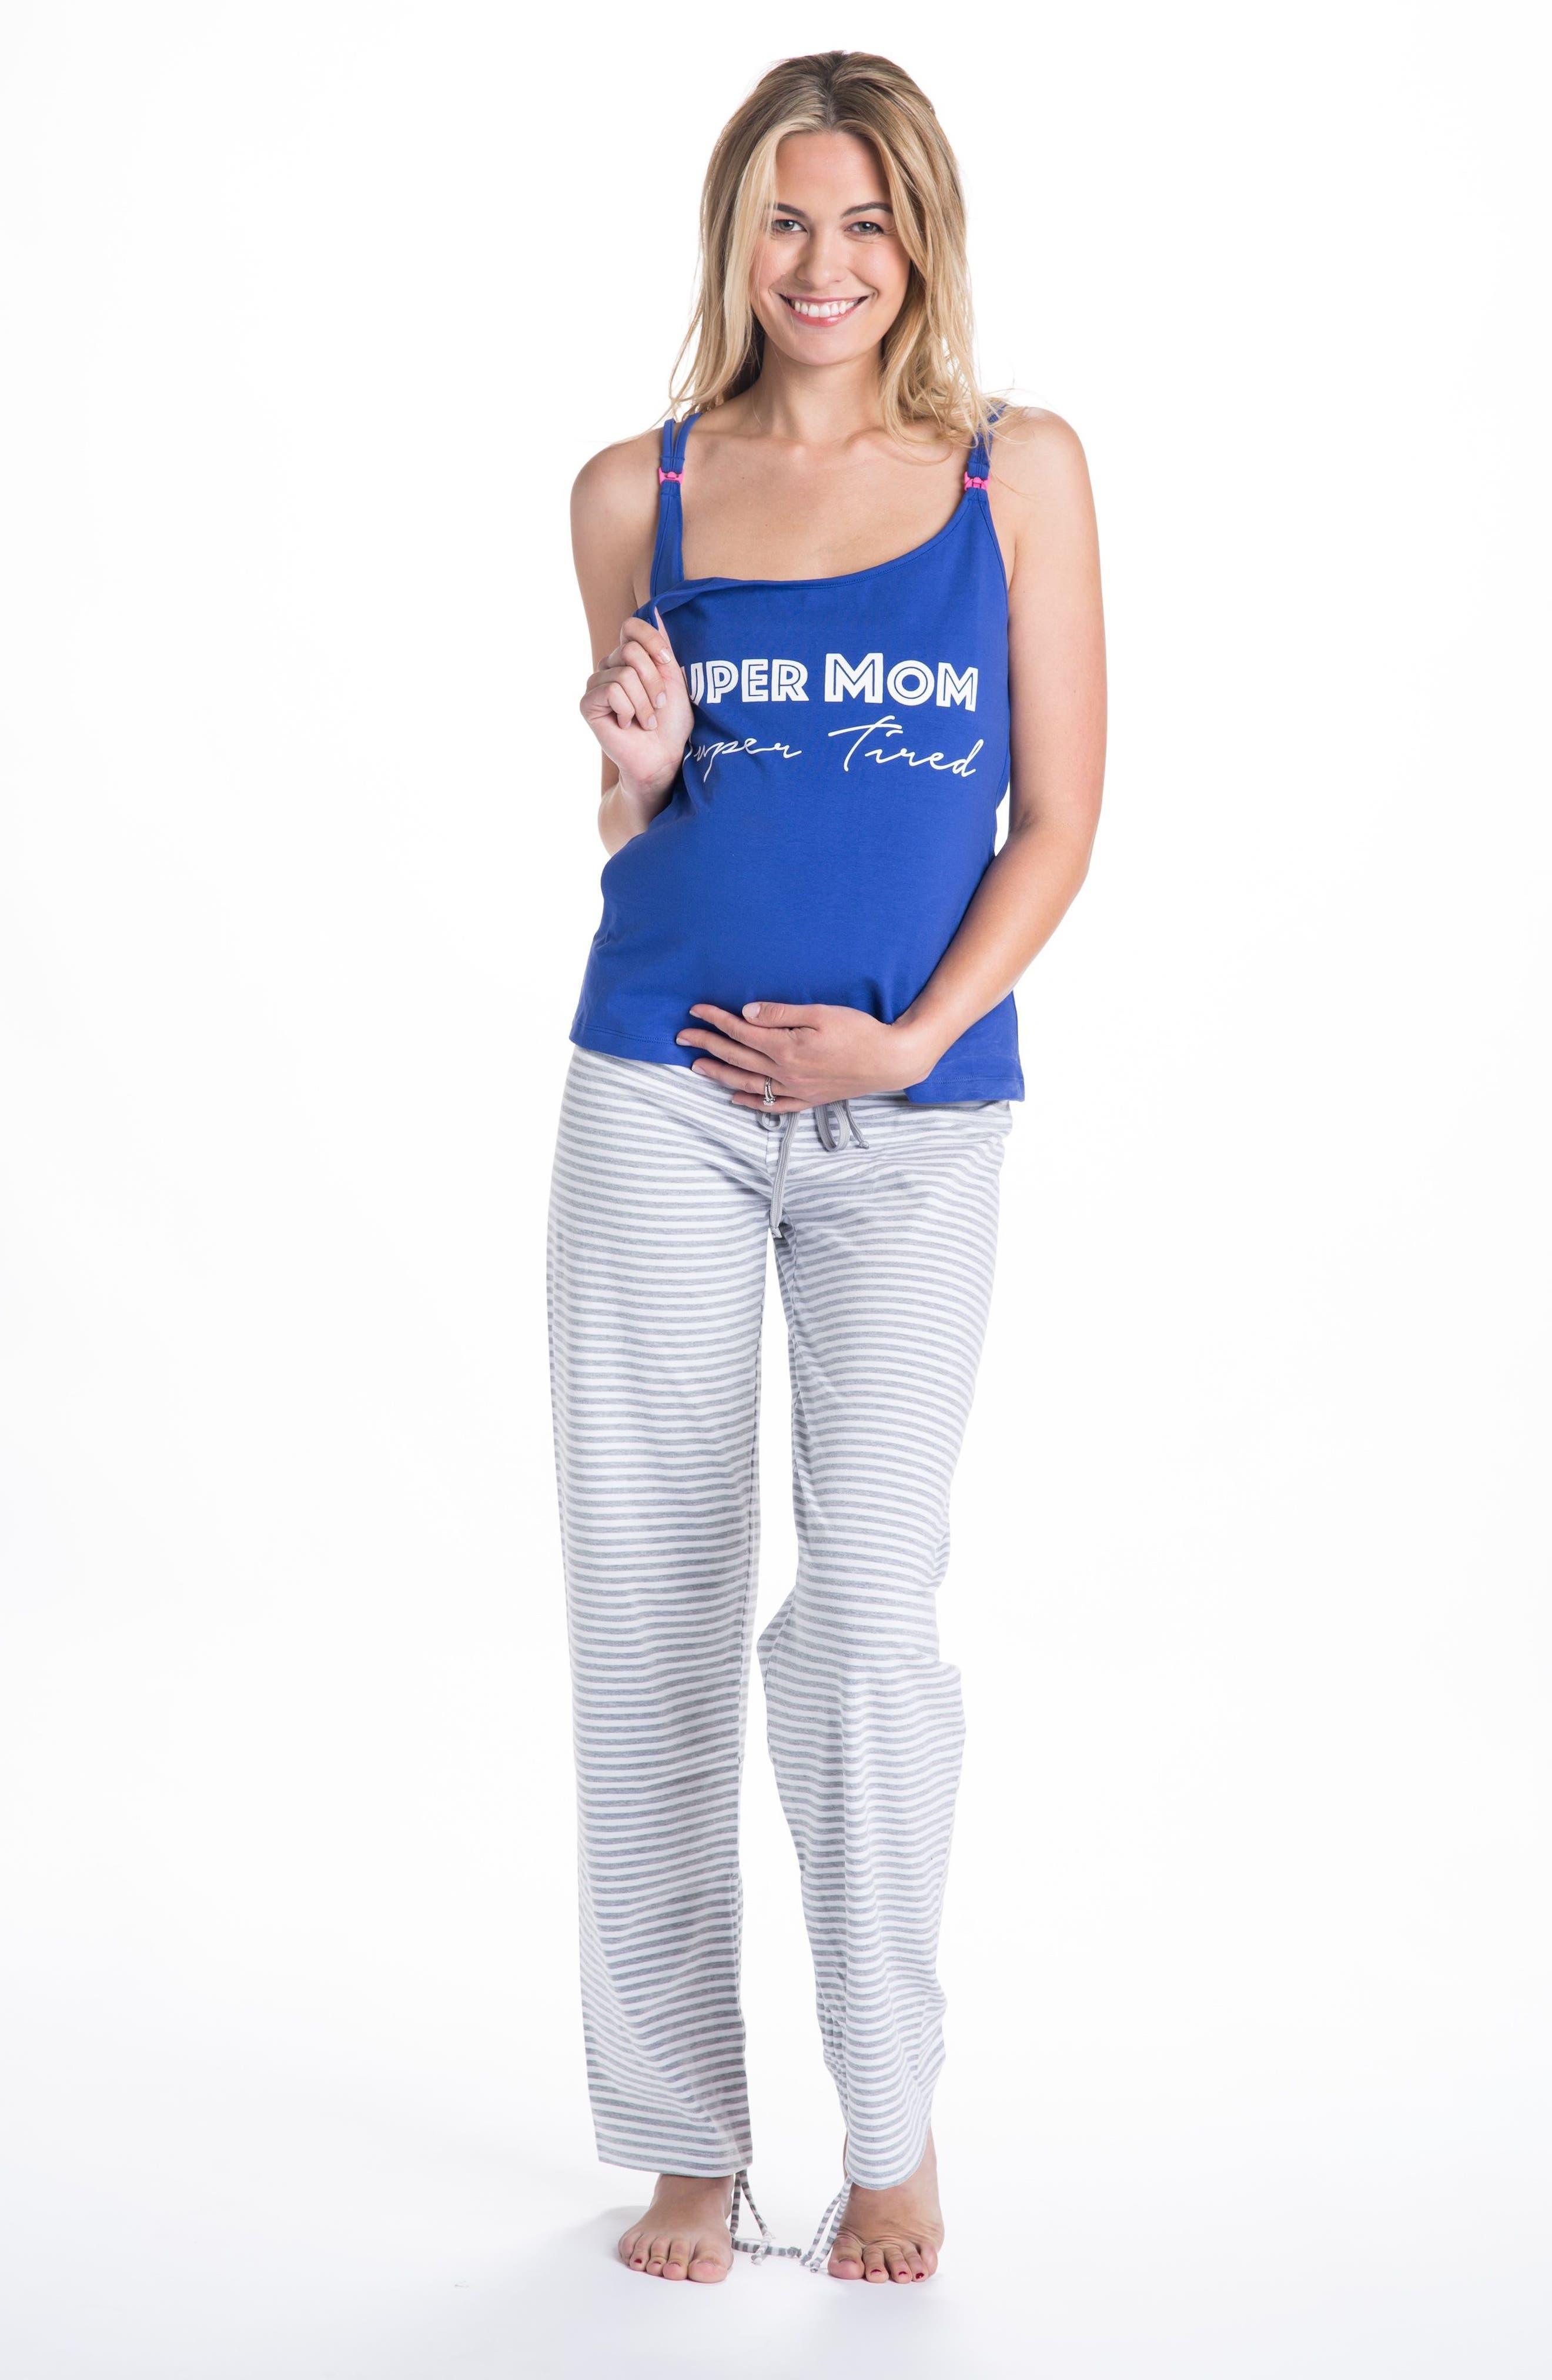 Trudy Super Mom Maternity/Nursing Pajamas,                             Alternate thumbnail 3, color,                             NAVY BLUE/ GRAY/ WHITE STRIPES